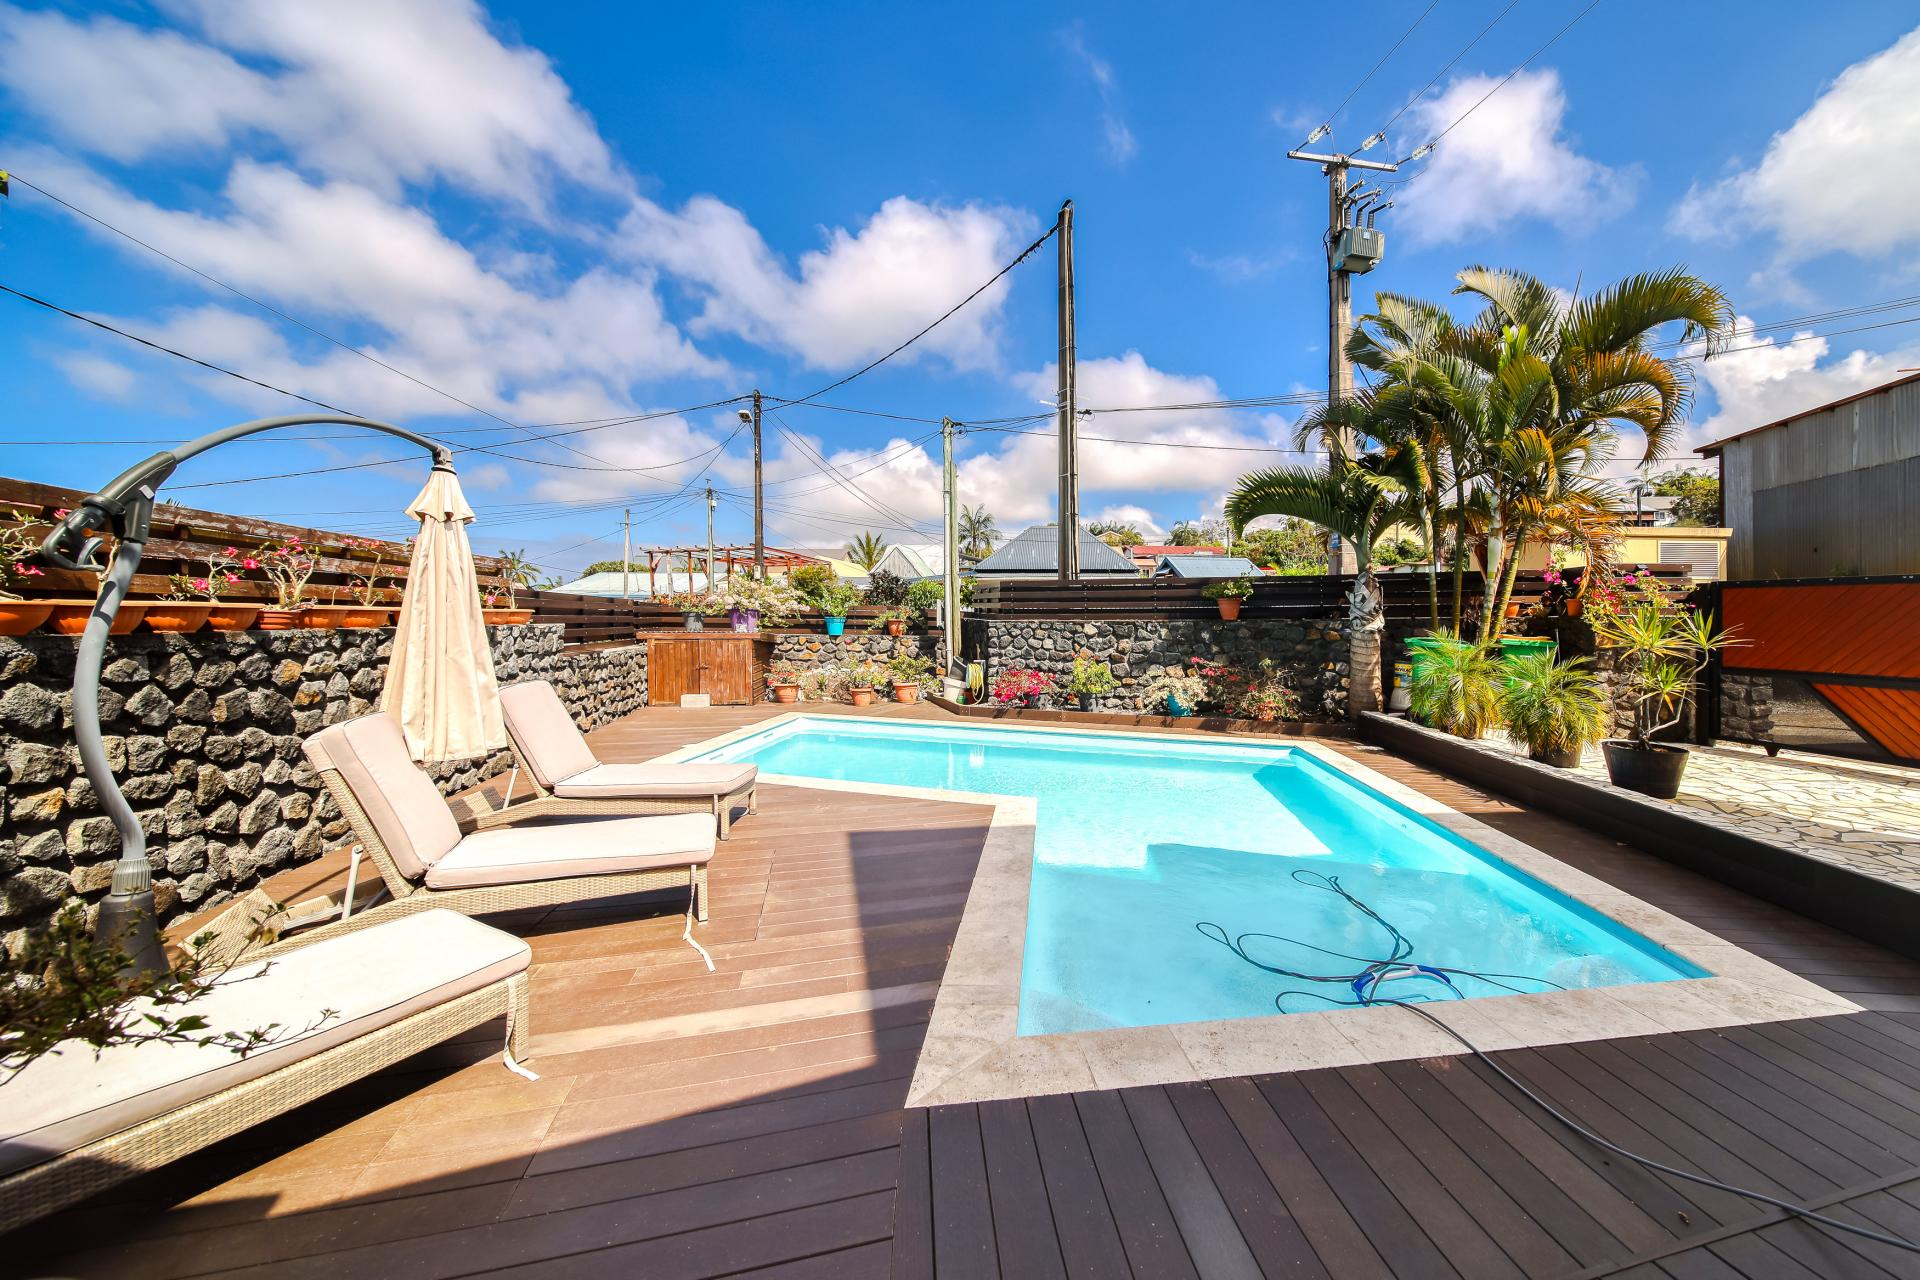 Villa avec Piscine sur PETITE ILE - SUD - Réunion